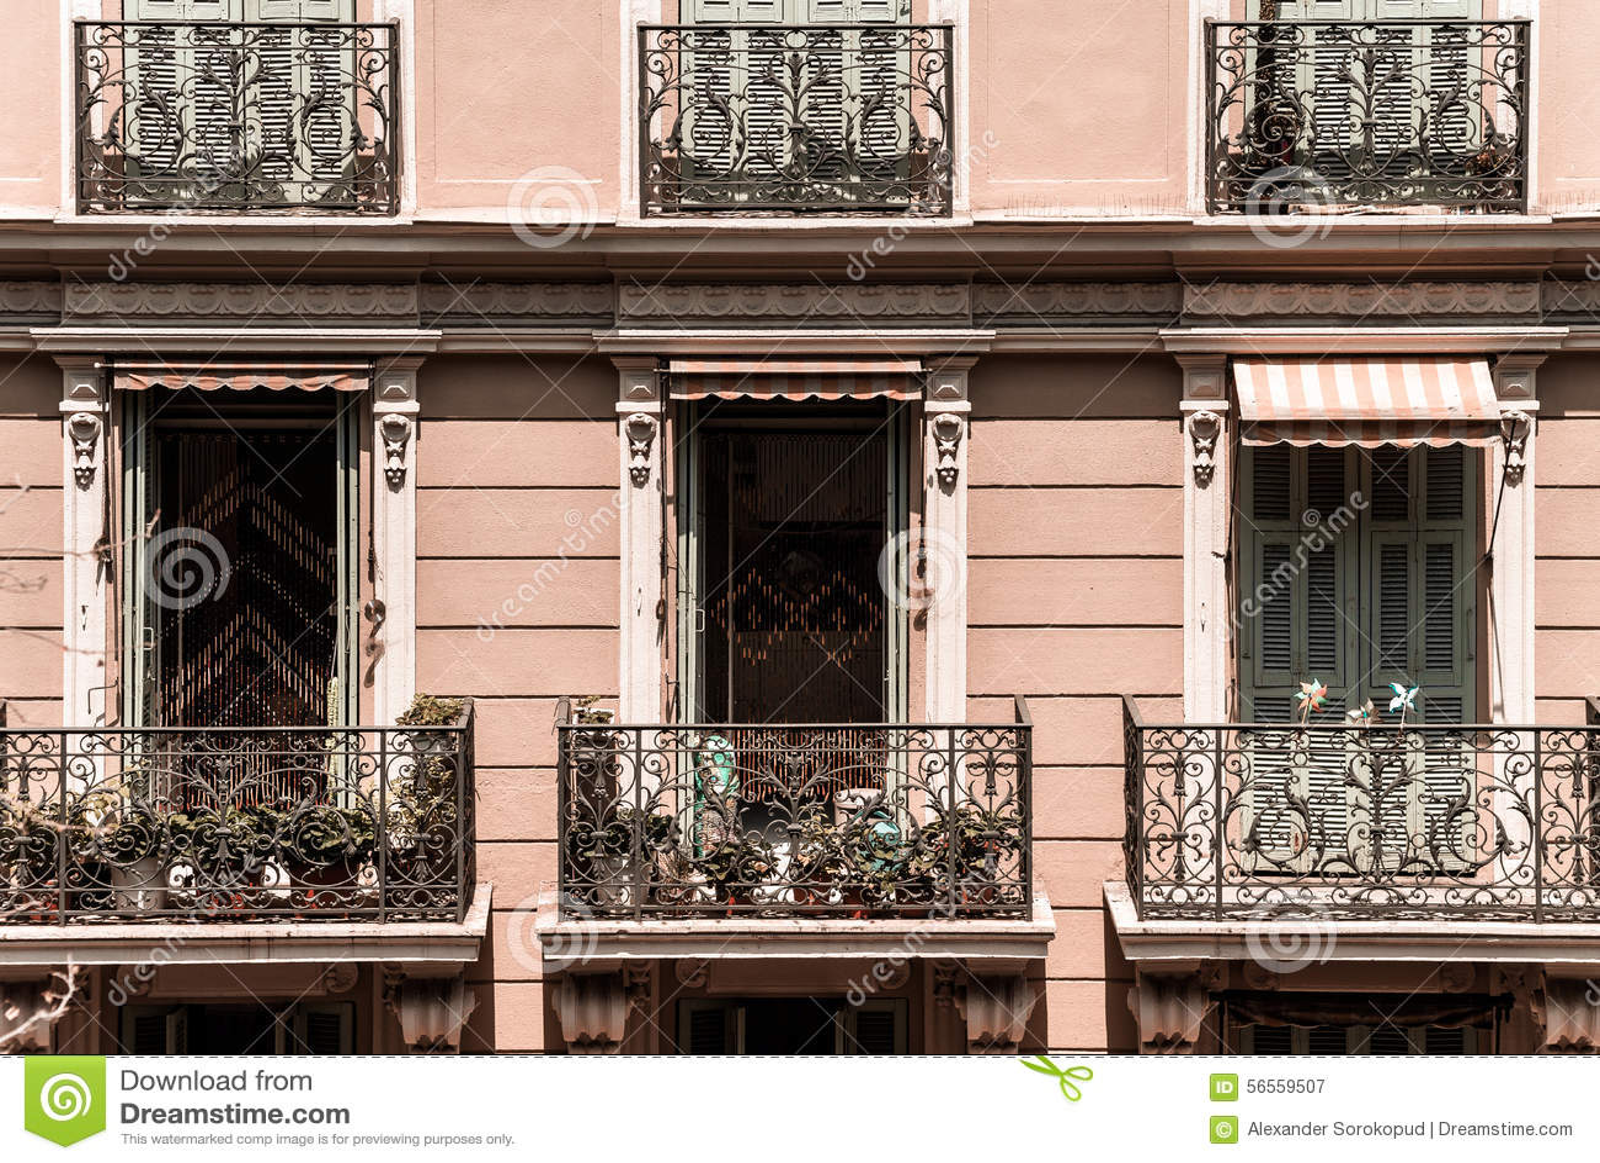 Download Νέα παράθυρα PVC στα παλαιά ανακαινισμένα σπίτια Σχέδιο και κατασκευή Στοκ Εικόνα - εικόνα από μονακό, νέος: 56559507